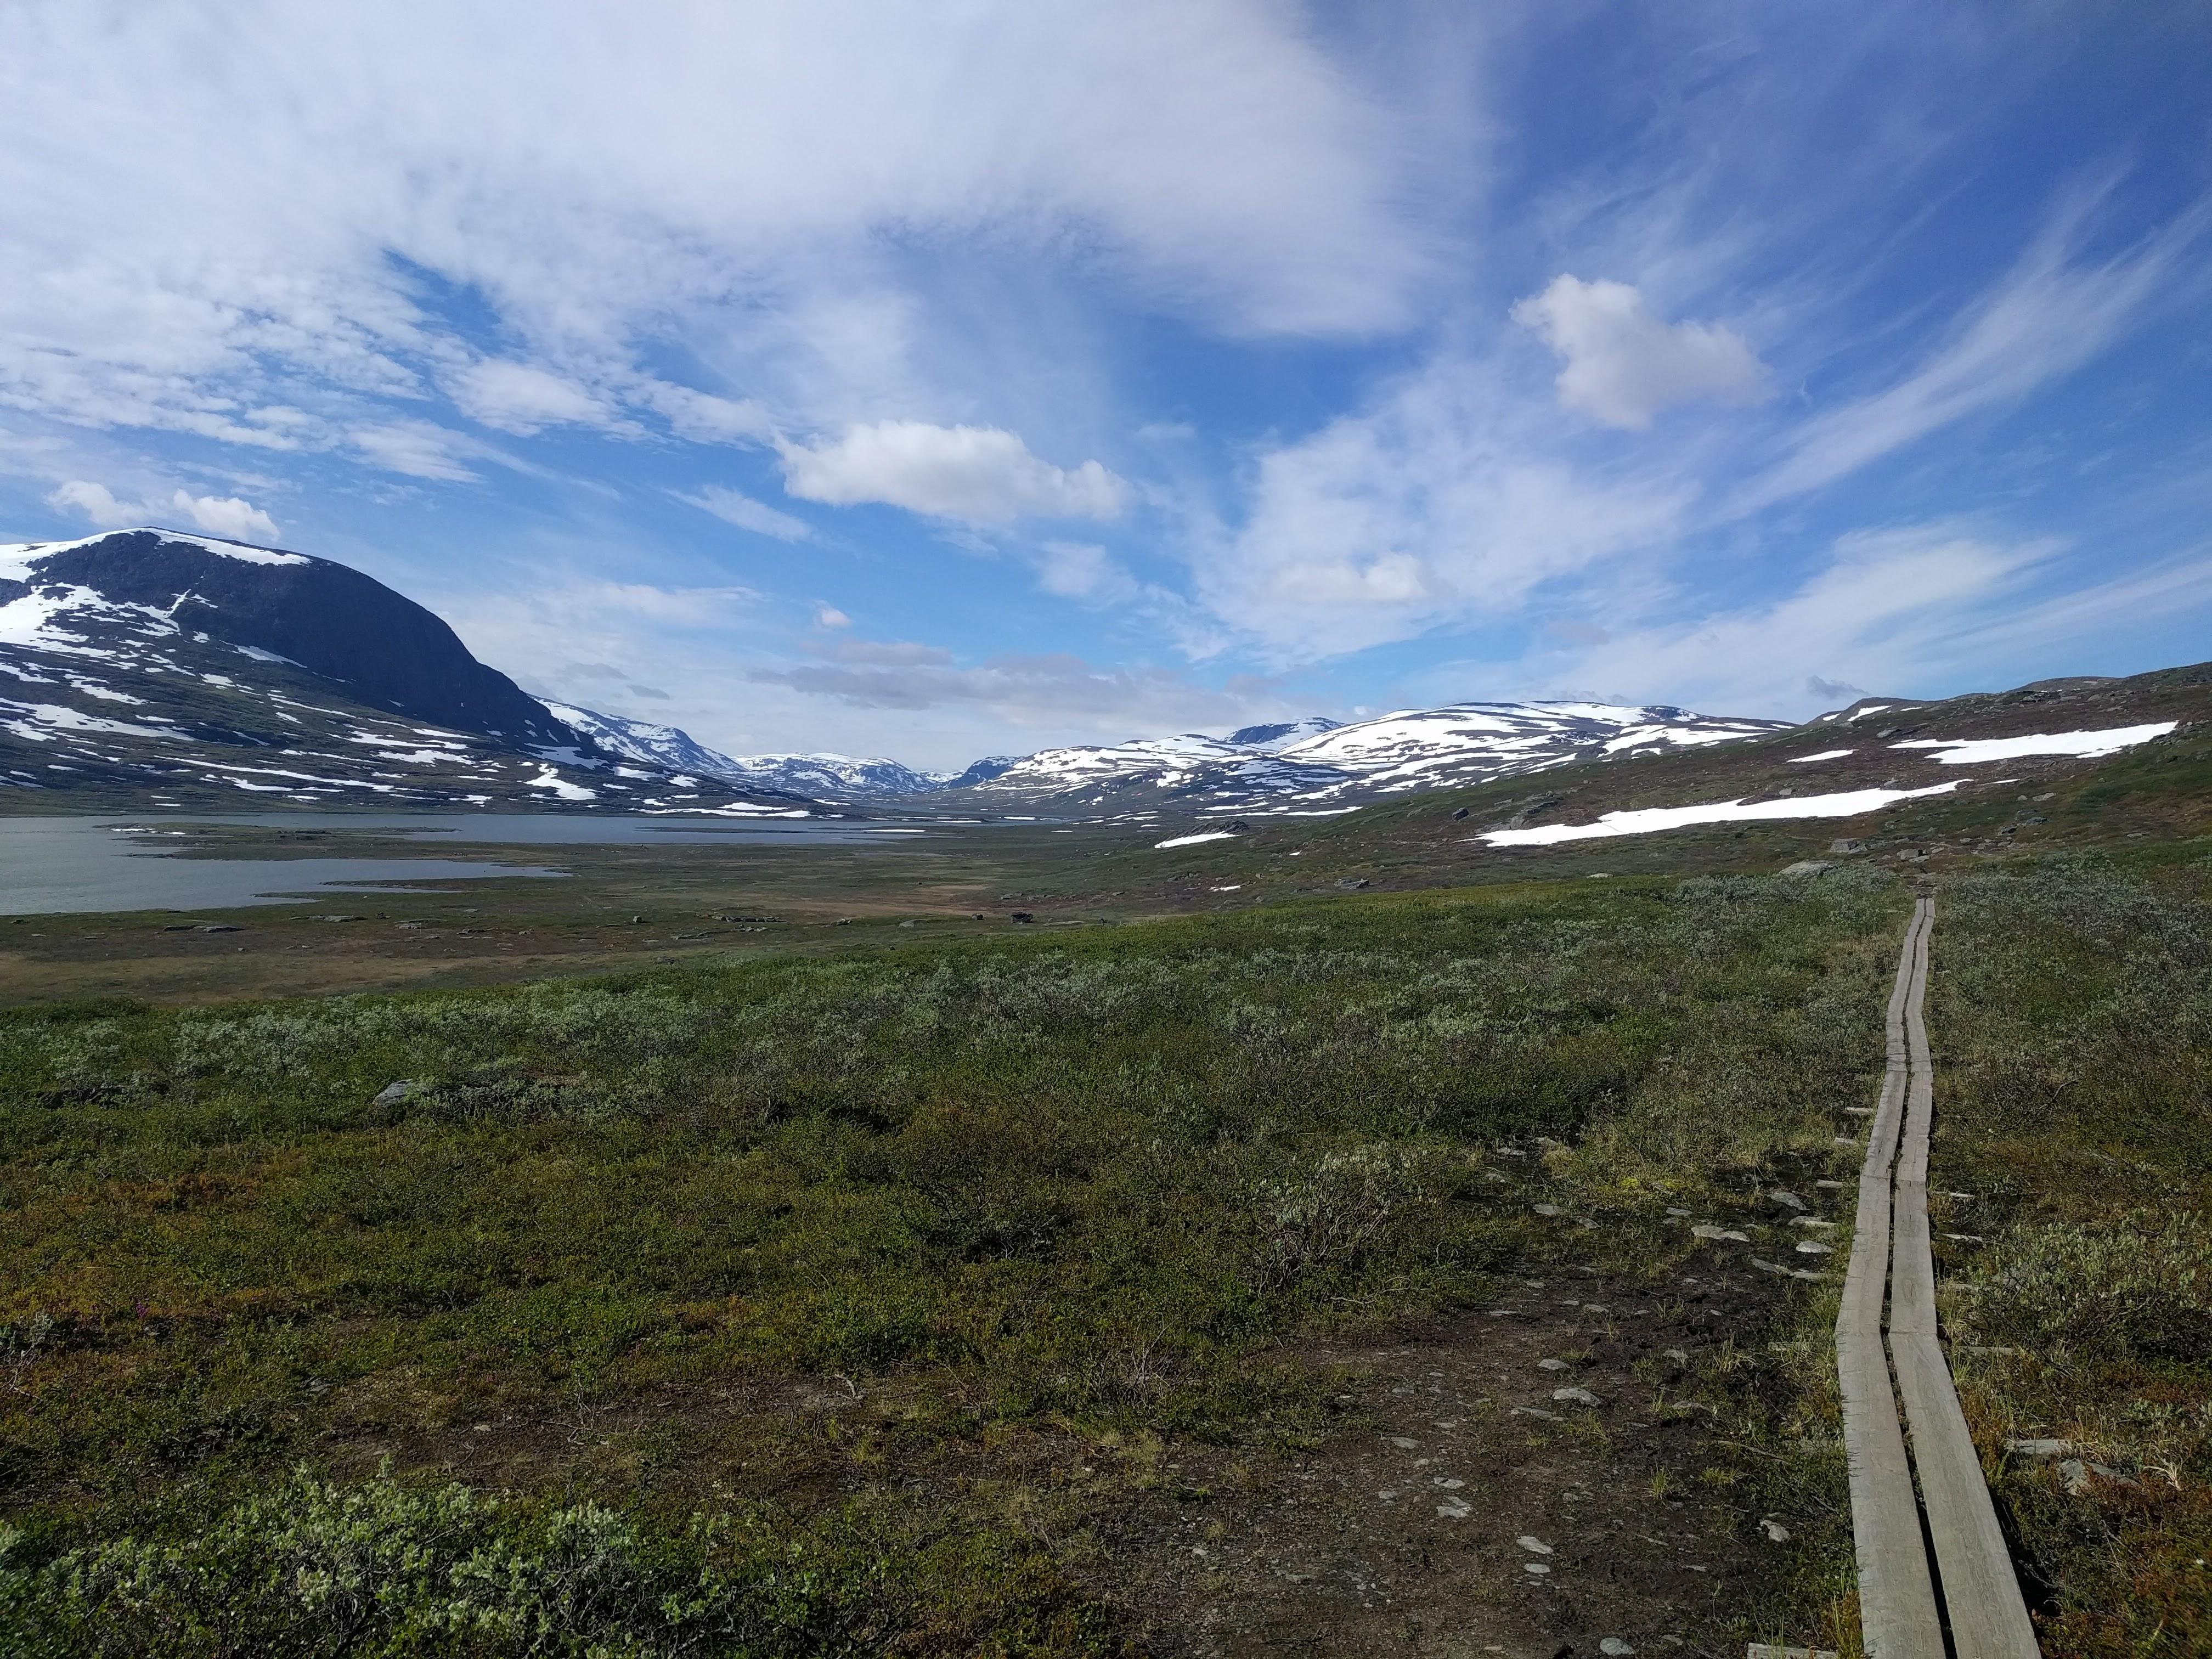 Hiking on board walks from Abiskojaure to Alesjaure